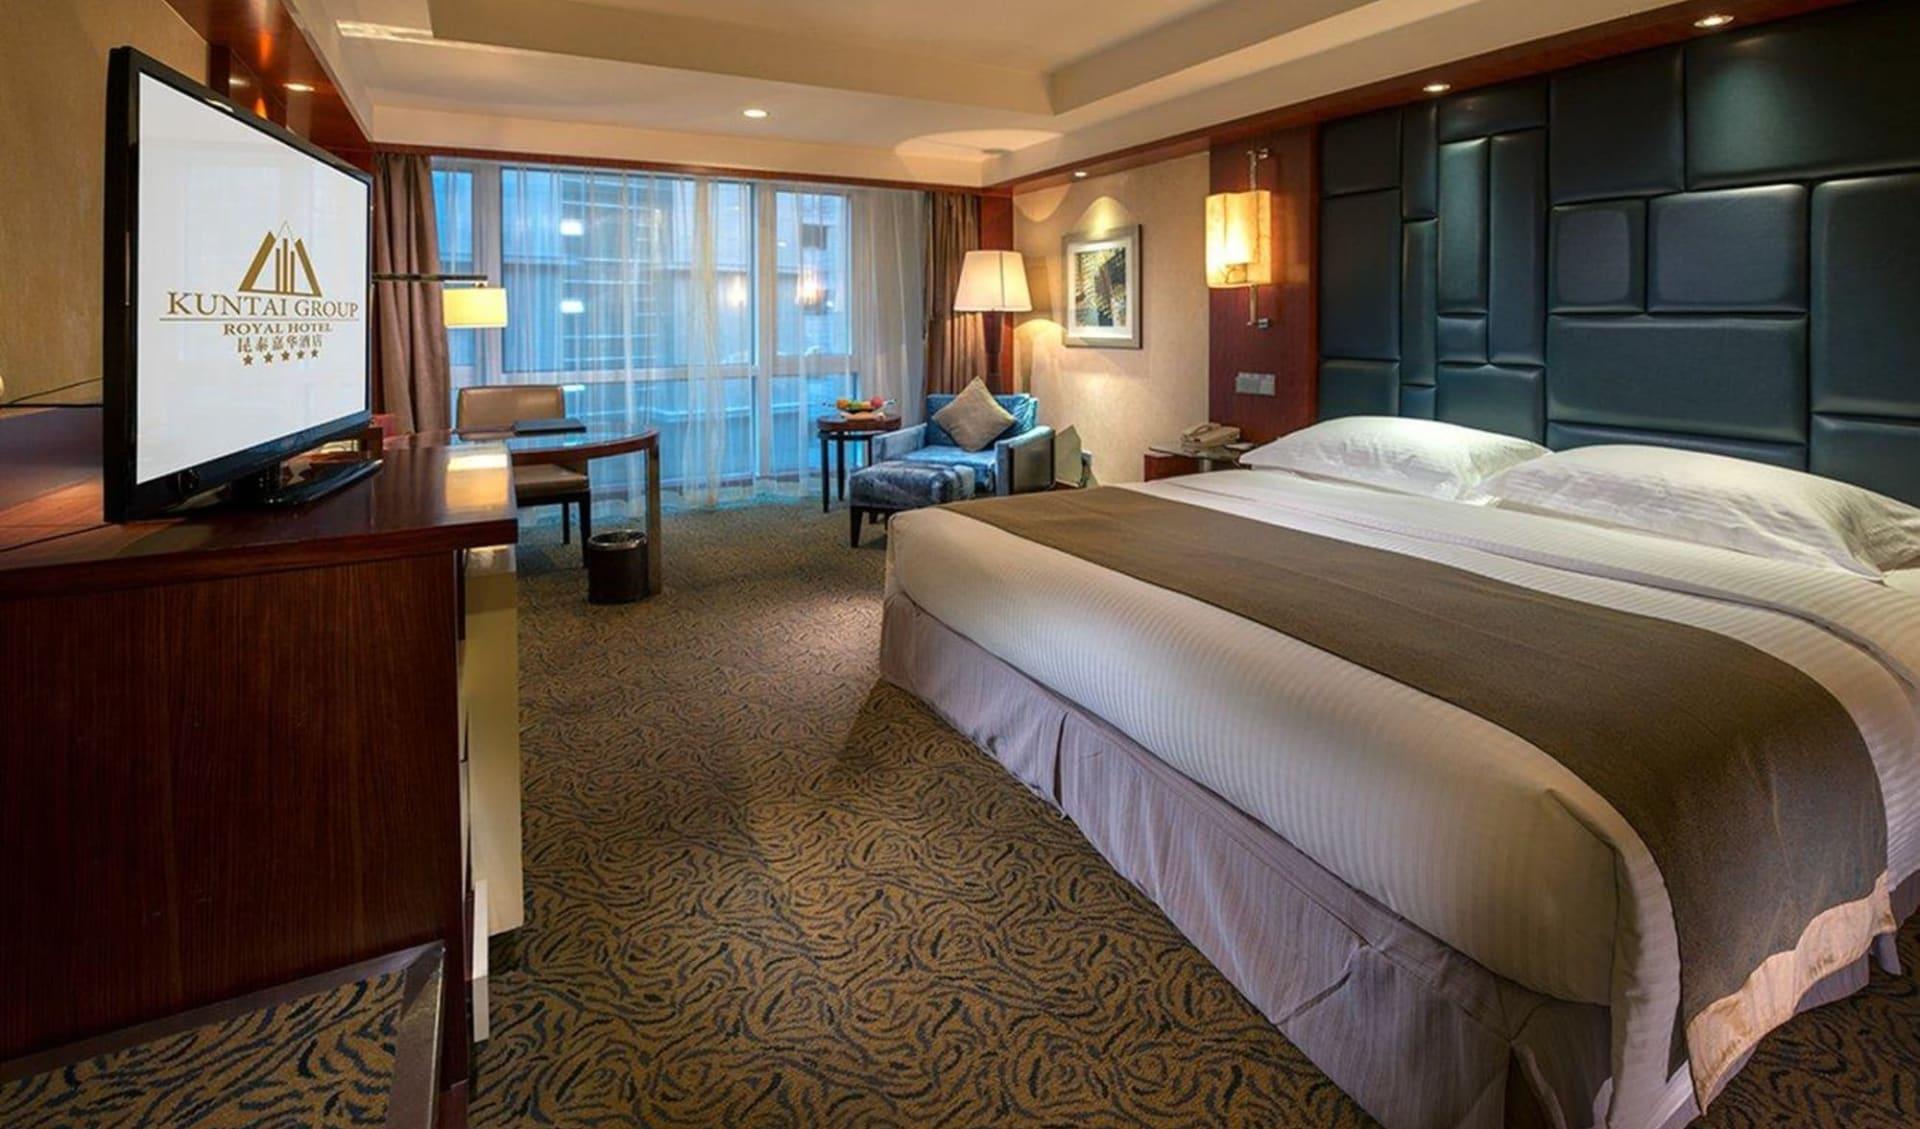 Hotel Kuntai Royal in Peking: Hotel Kuntai BJS deluxe-room